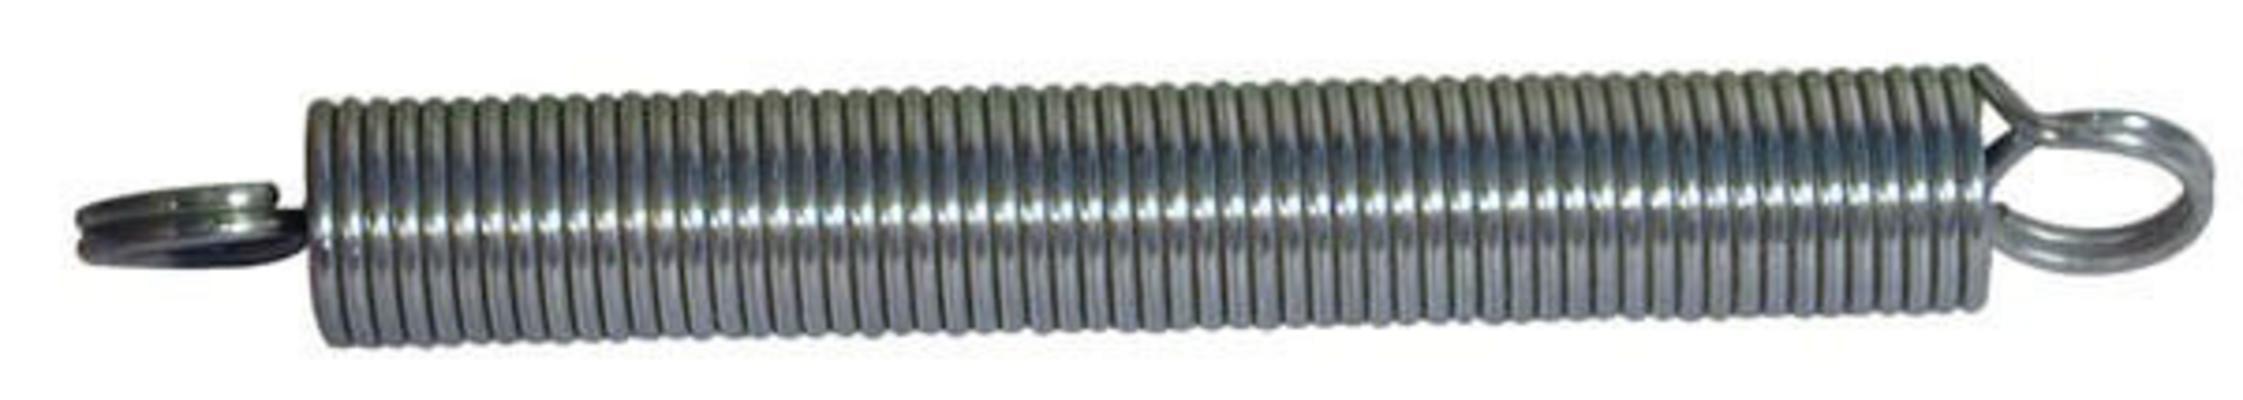 Vetojousi 0,6 mm x 6 x 25 mm 20/kpl - Vetojousi 0,6 mm x 6 x 25 mm